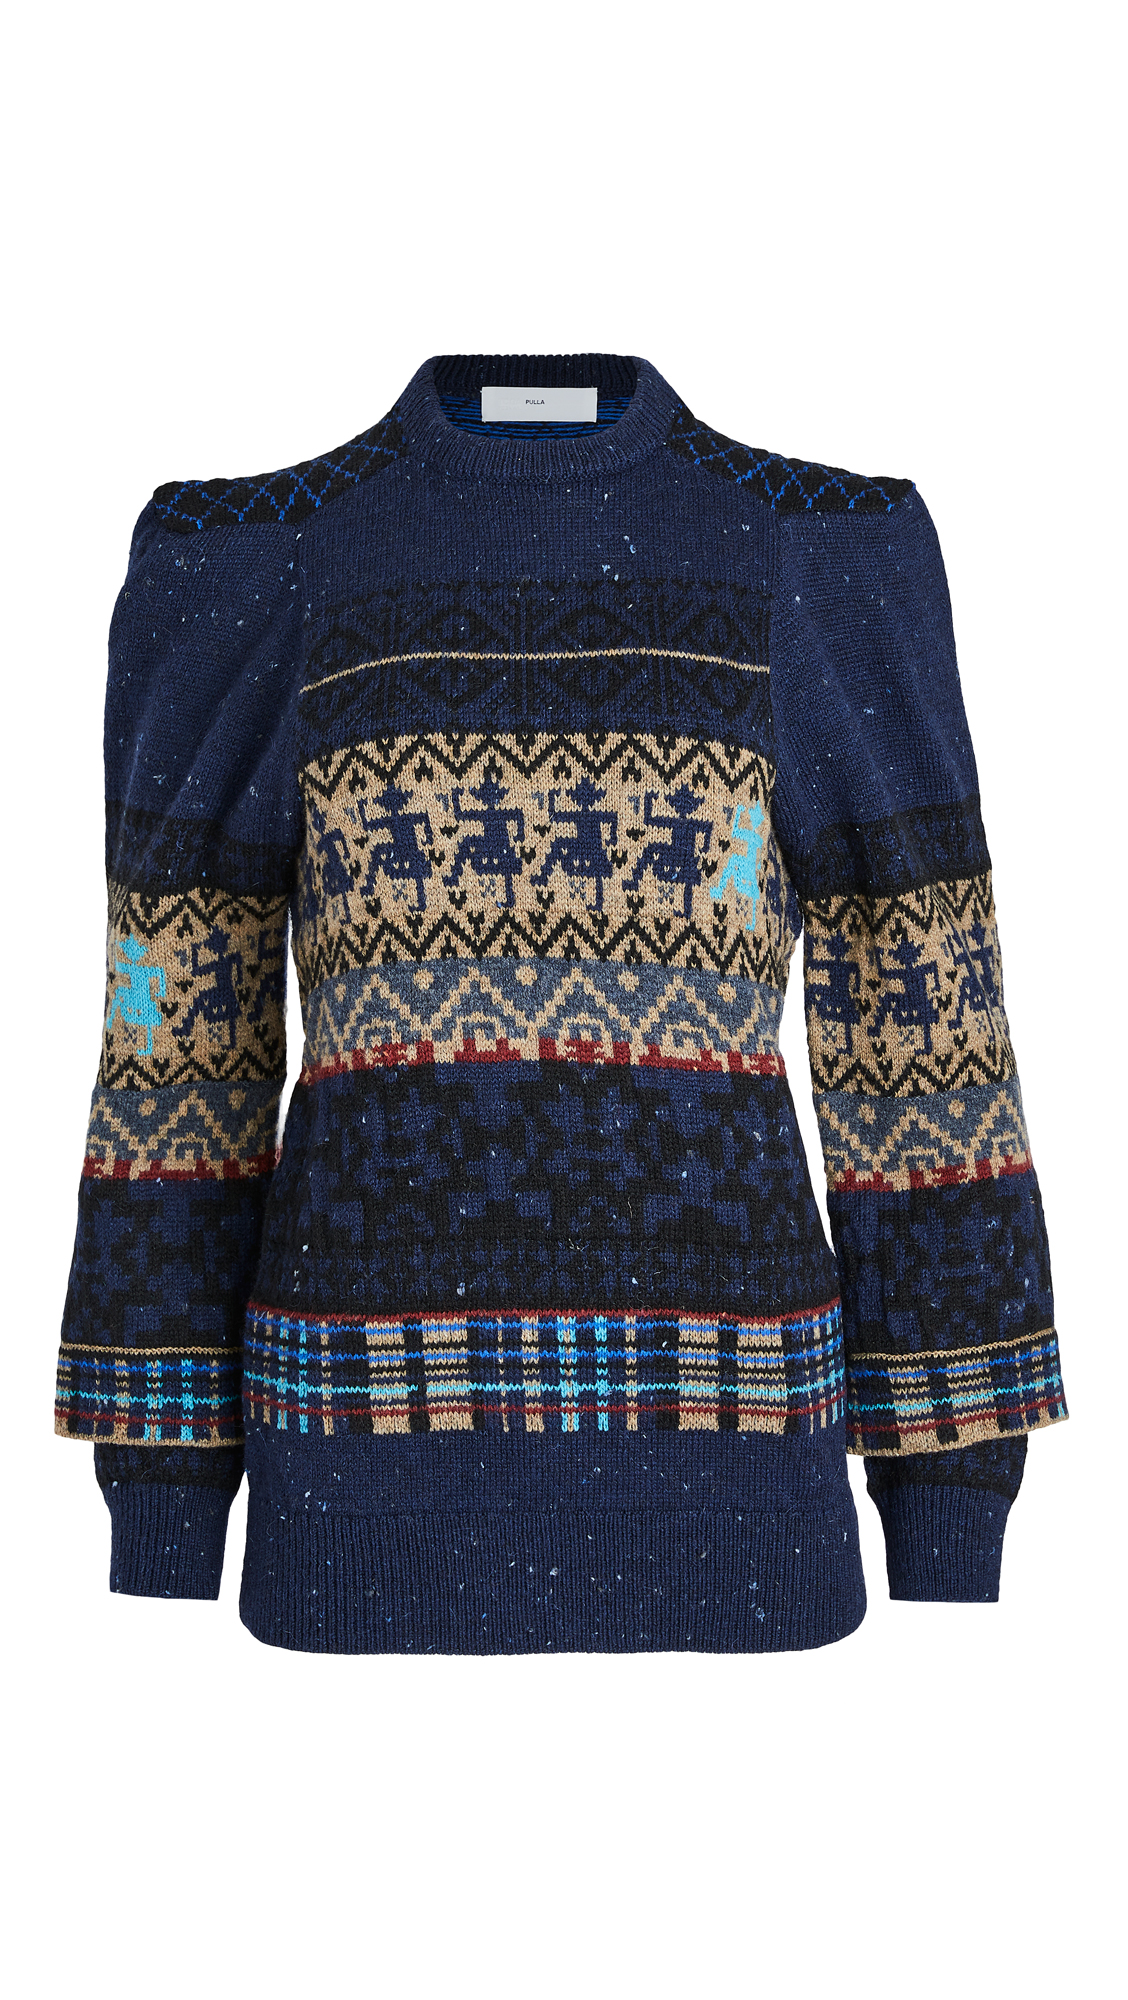 Toga Pulla Jaquard Knit Pullover